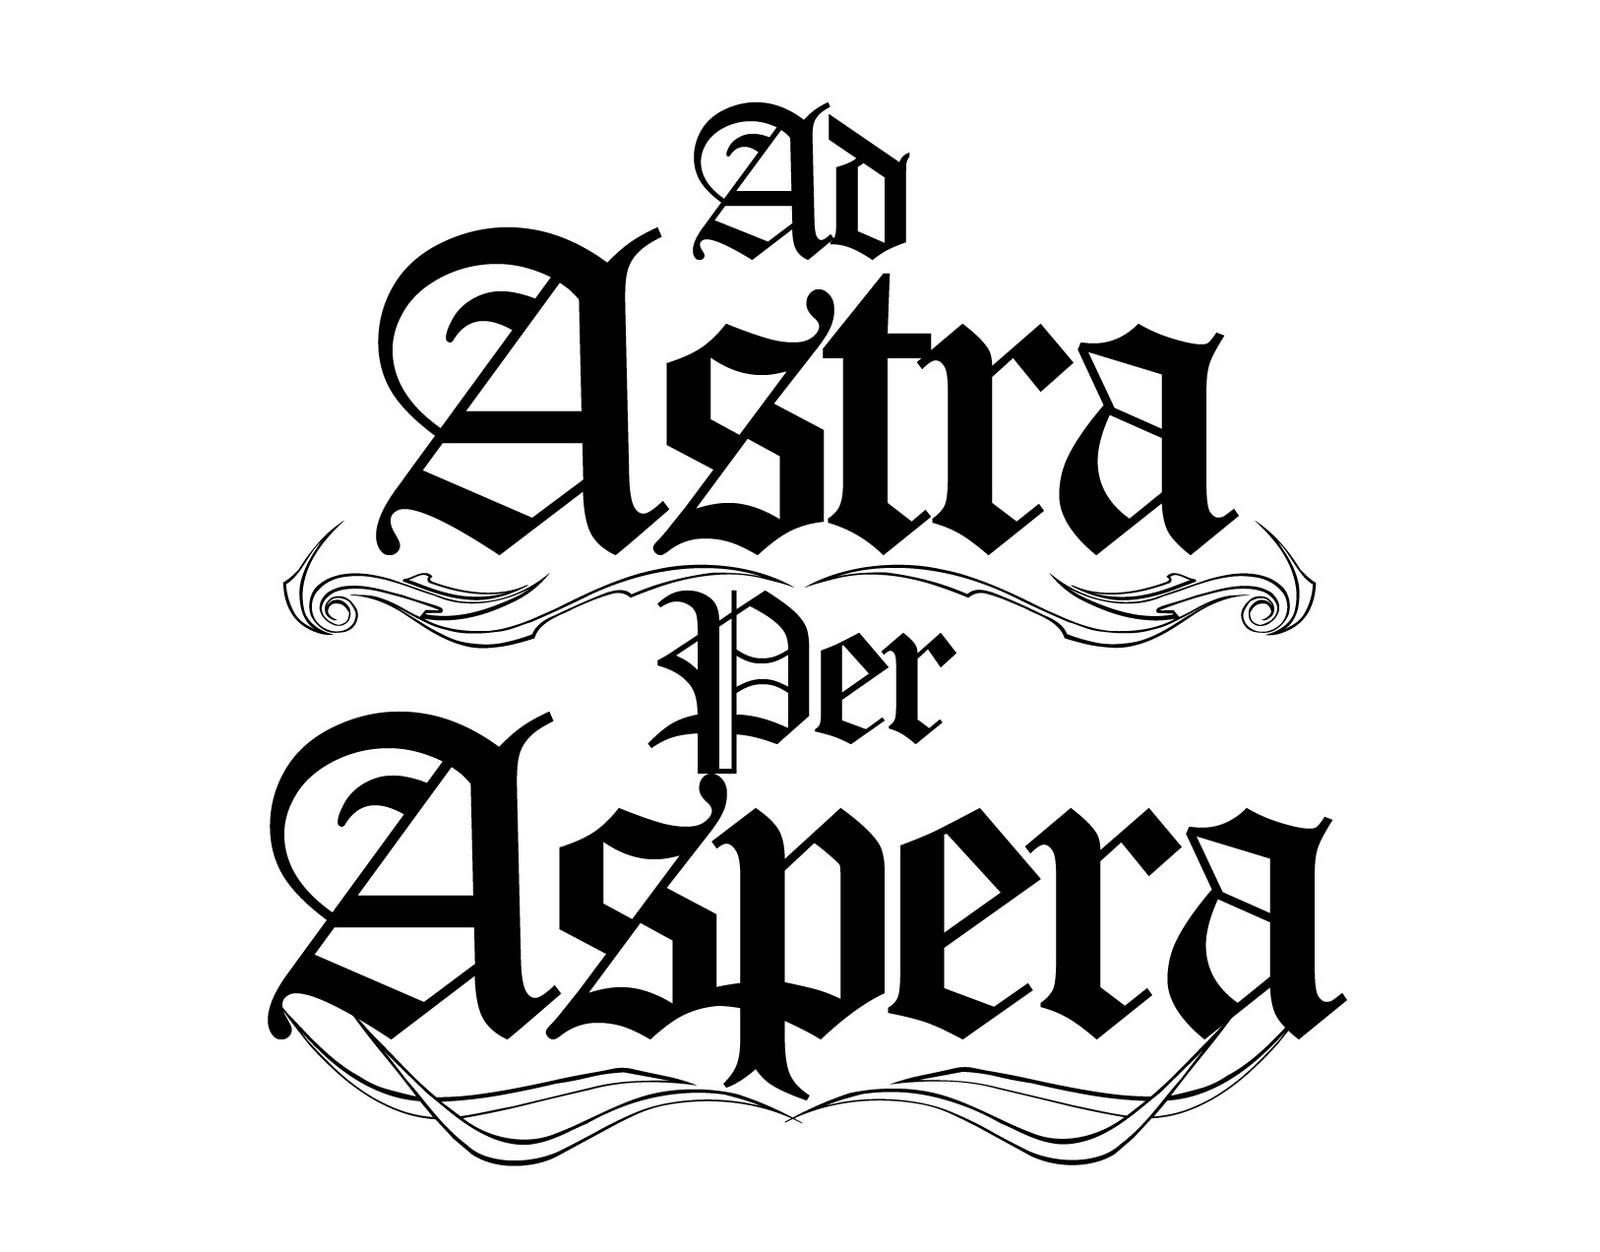 Ad Astra Per Aspera To The Stars Through Hardship